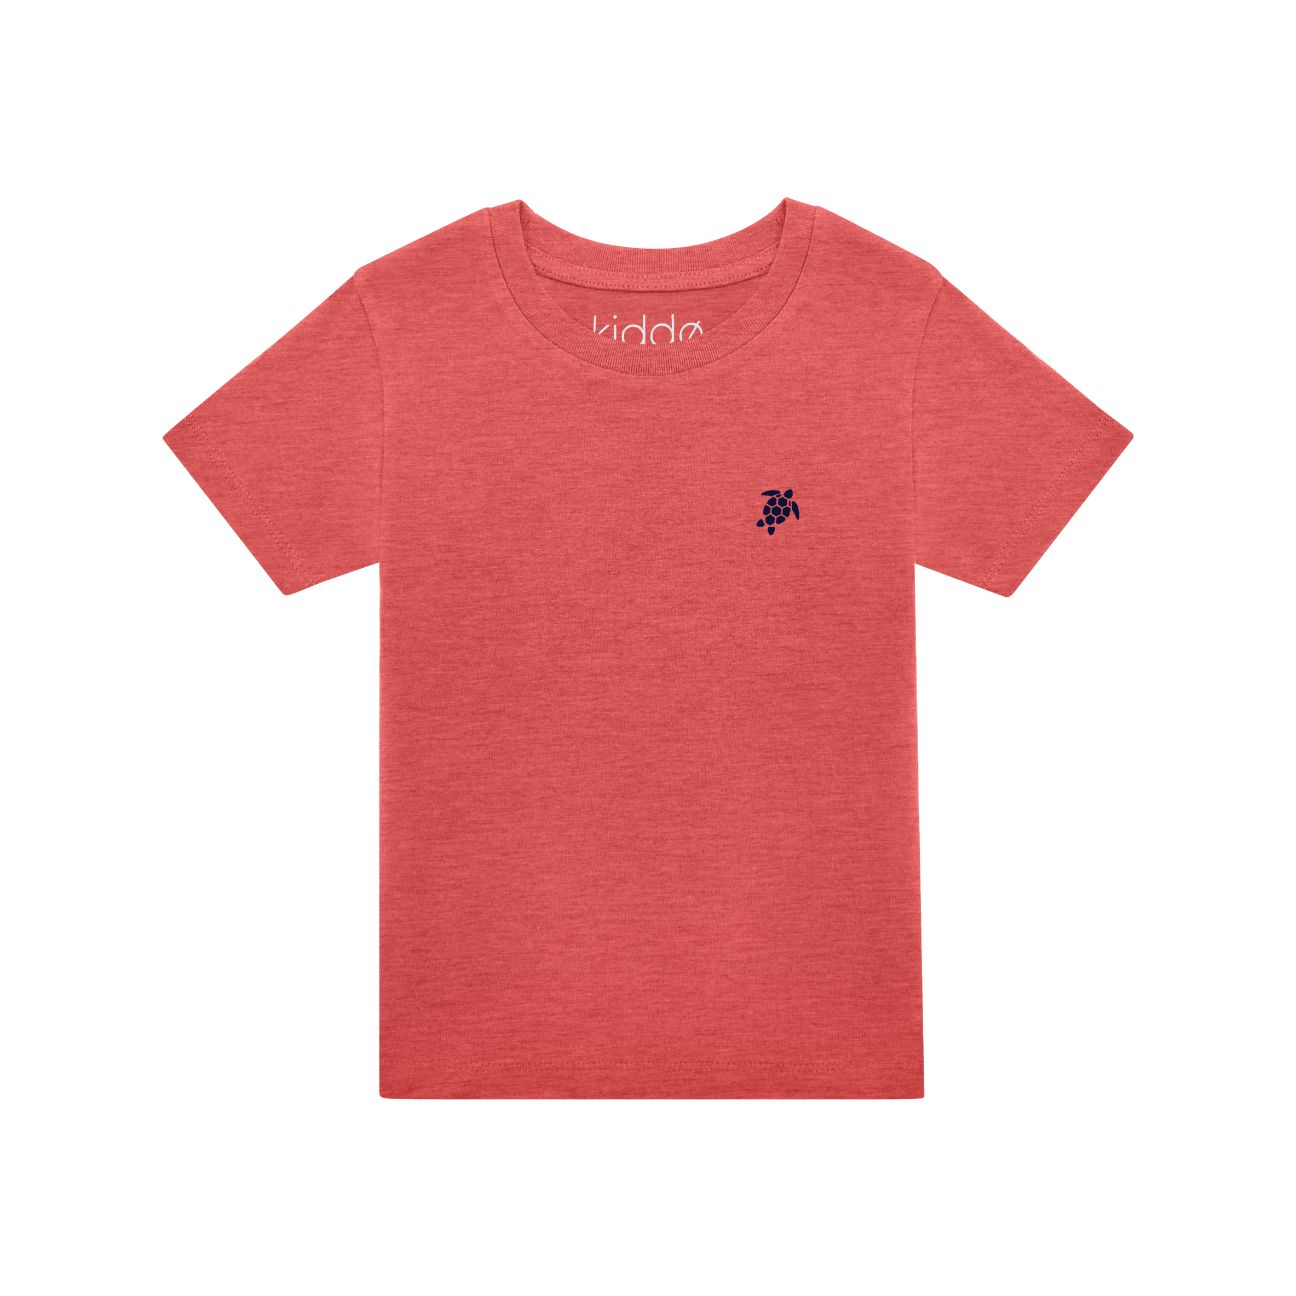 kiddø – Turtle – t-shirt